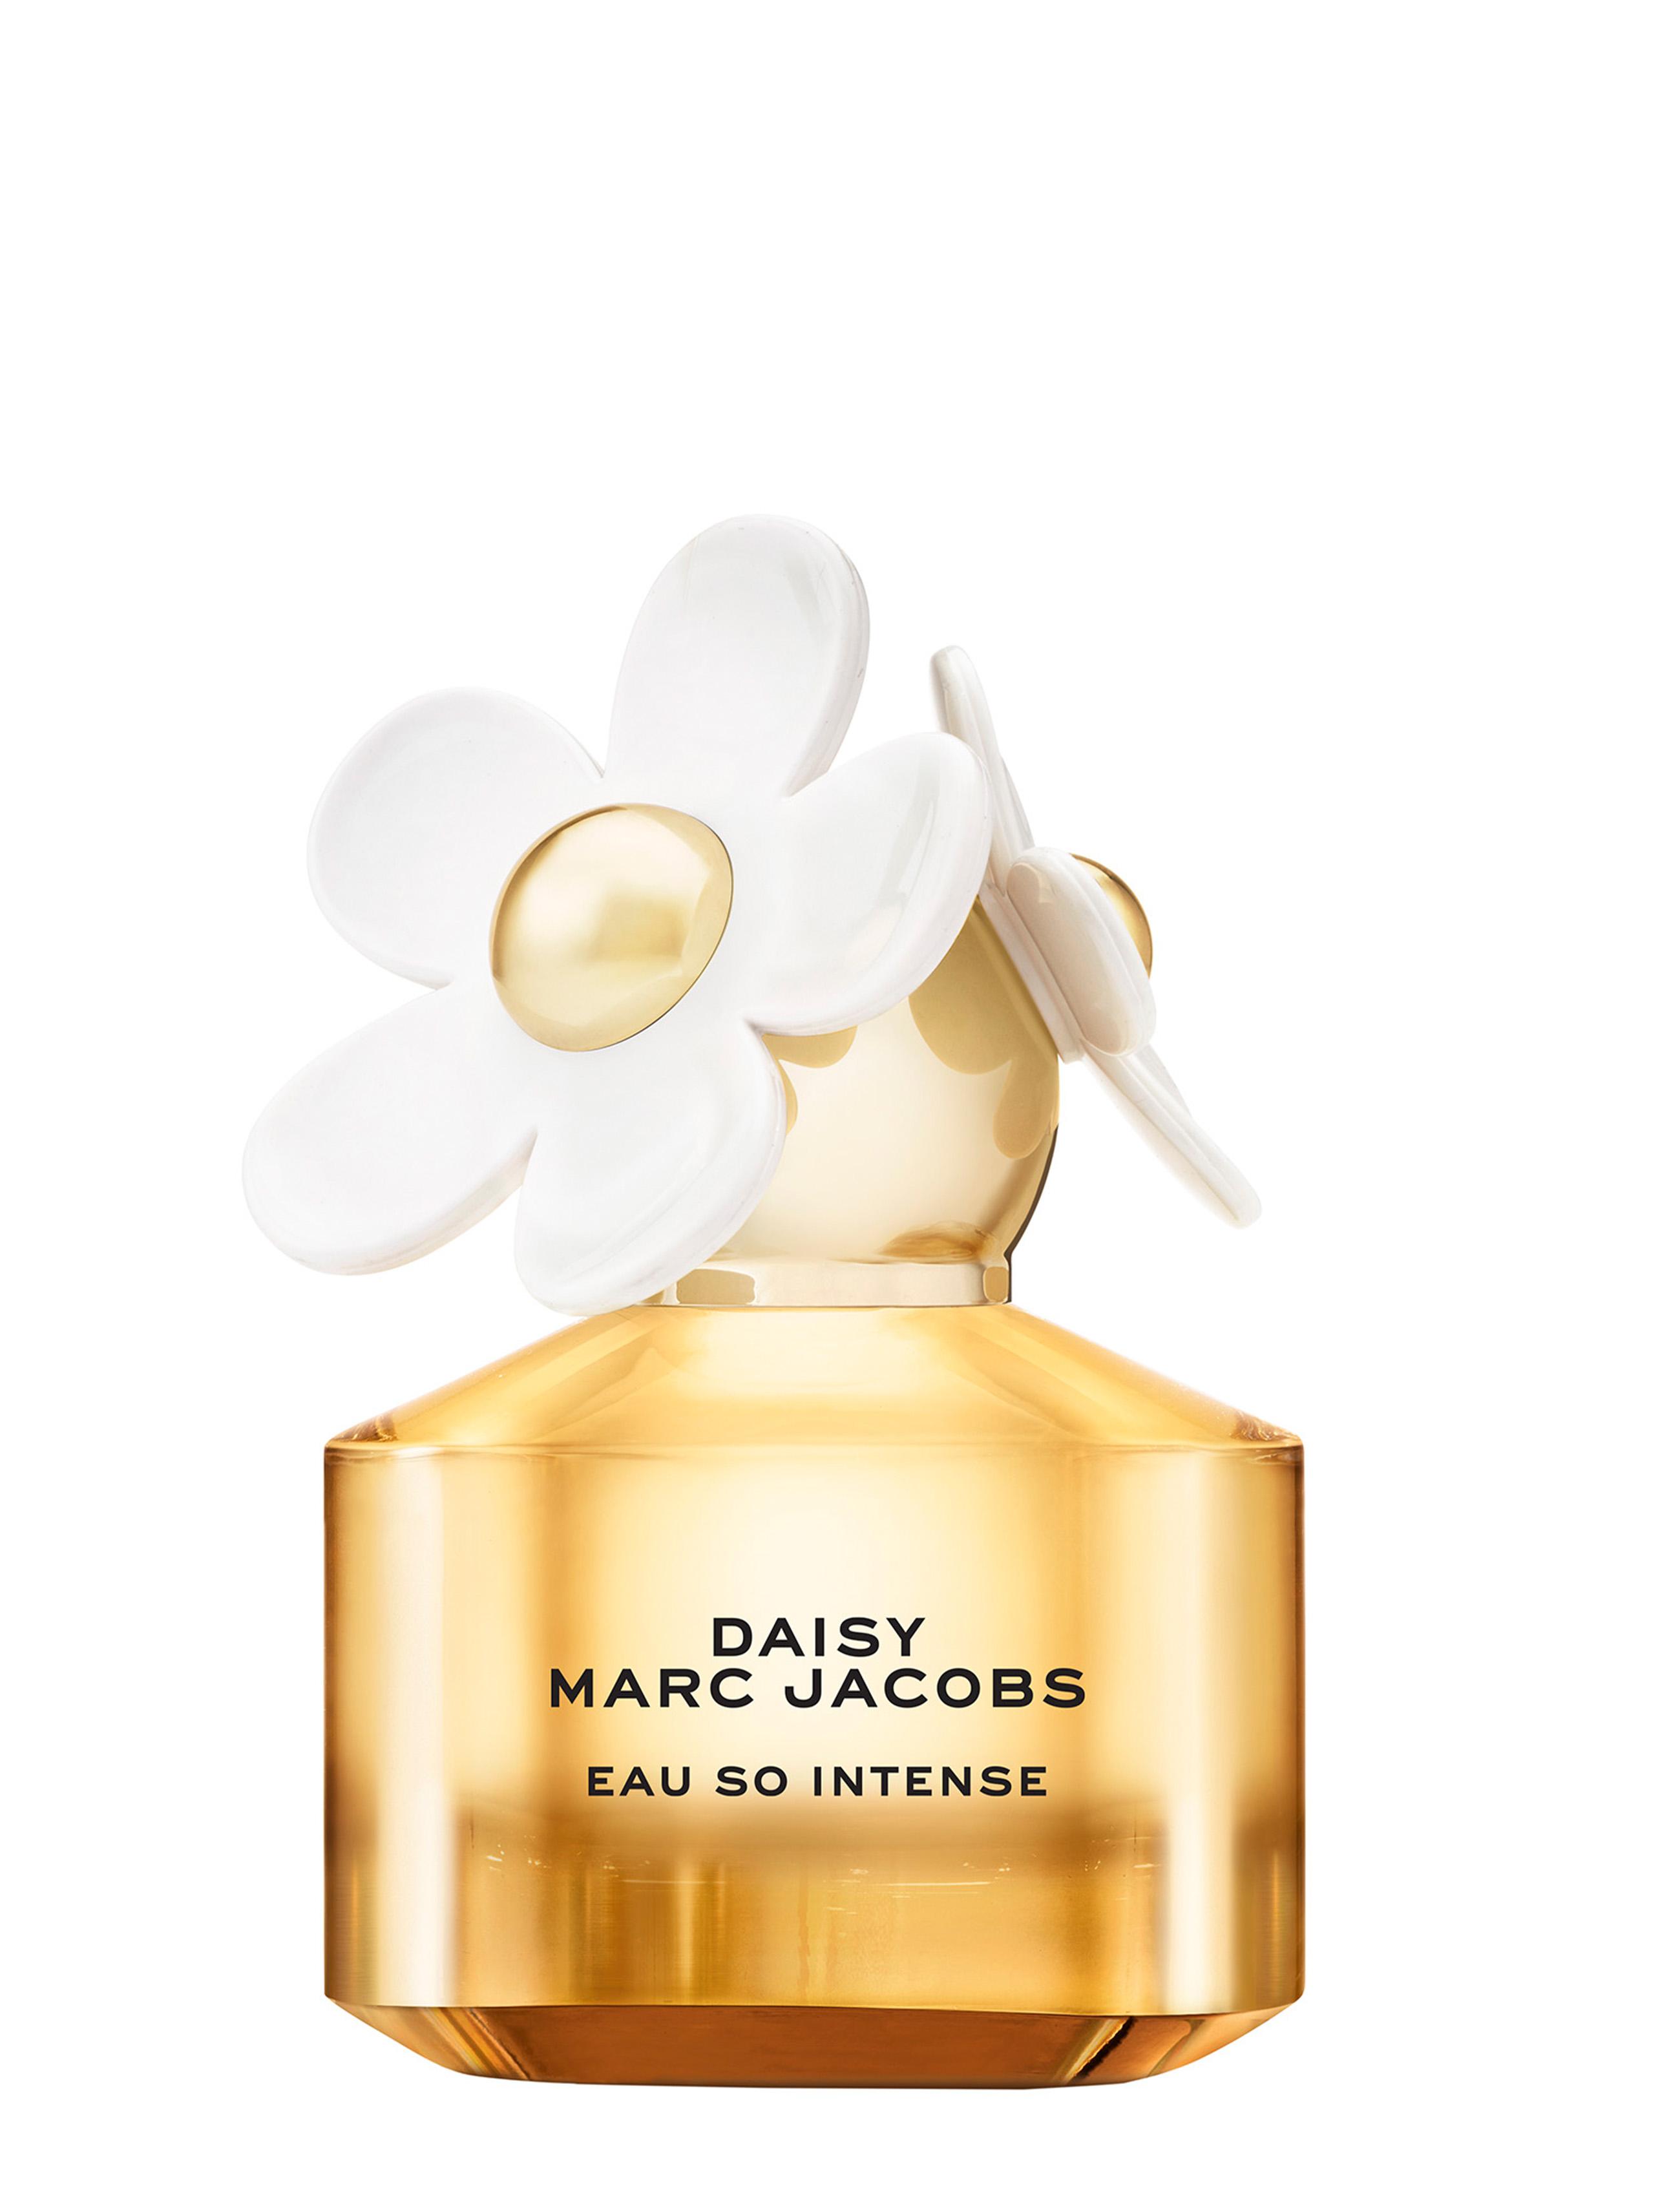 Marc Jacobs Daisy Eau So Intense EDP, 30 ml